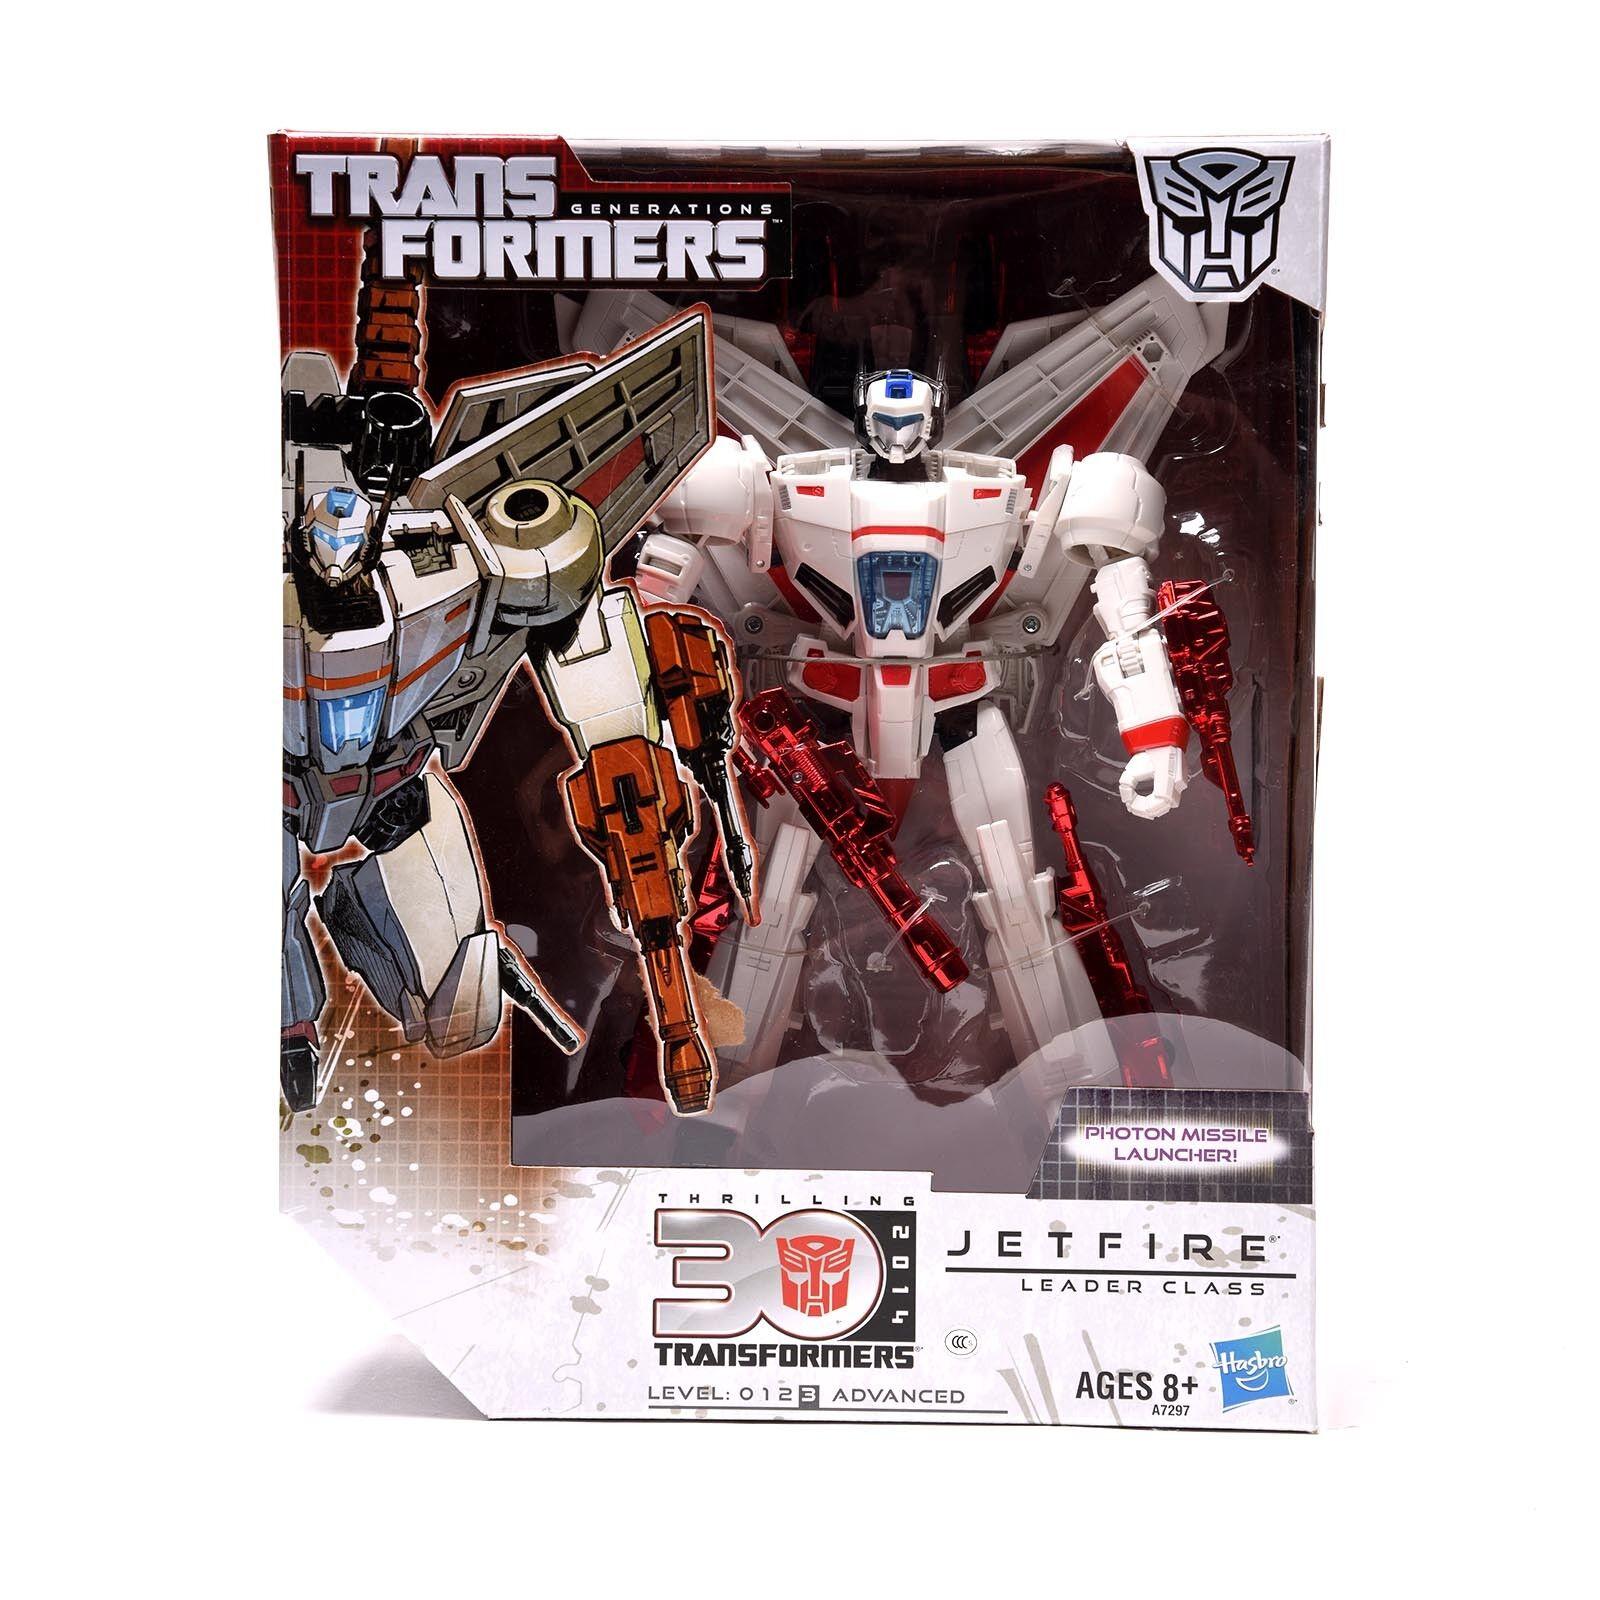 30th Anniversary Hasbro Transformers Generations Thrilling IDW Leader Jetfire